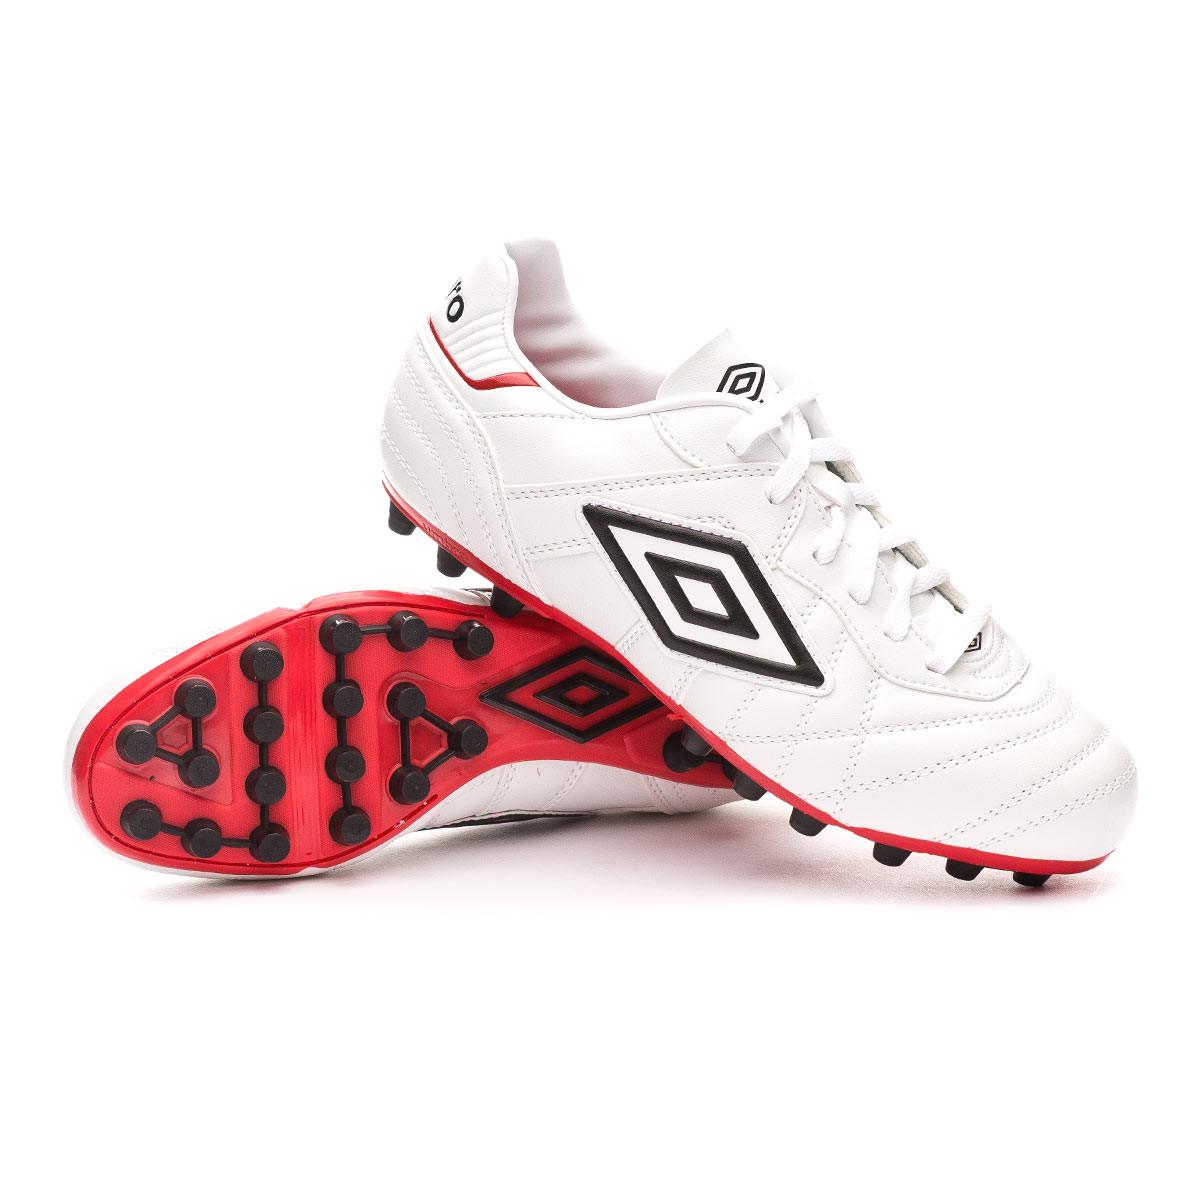 umbro speciali boots